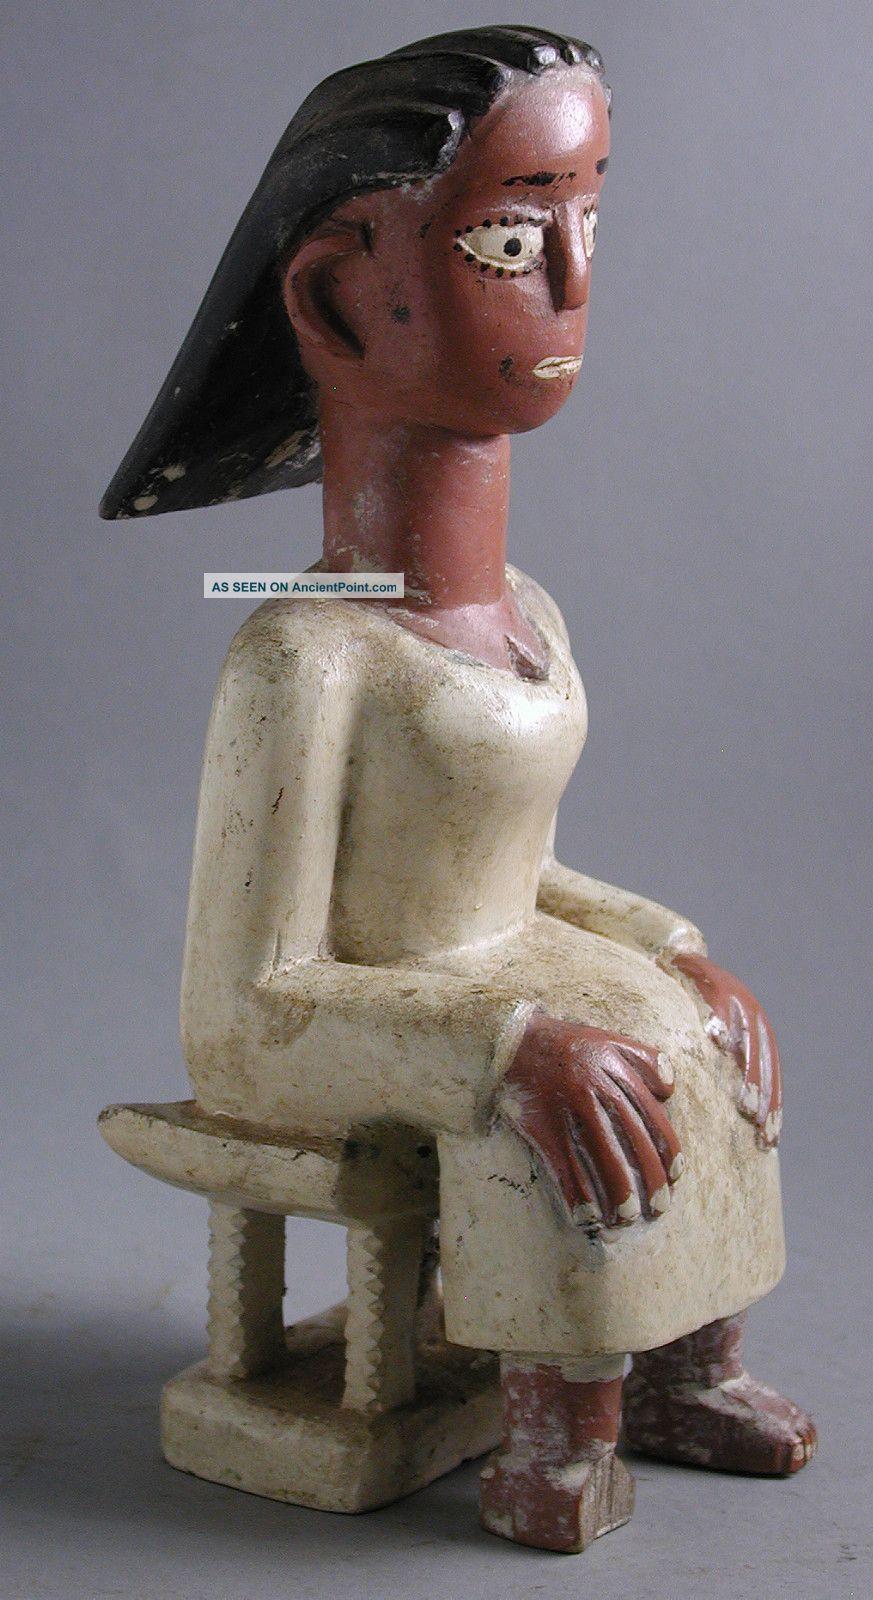 Akan African Ashante Female Ancestral Figure Mami Wata River Spirit Ghana Ethnix Other photo